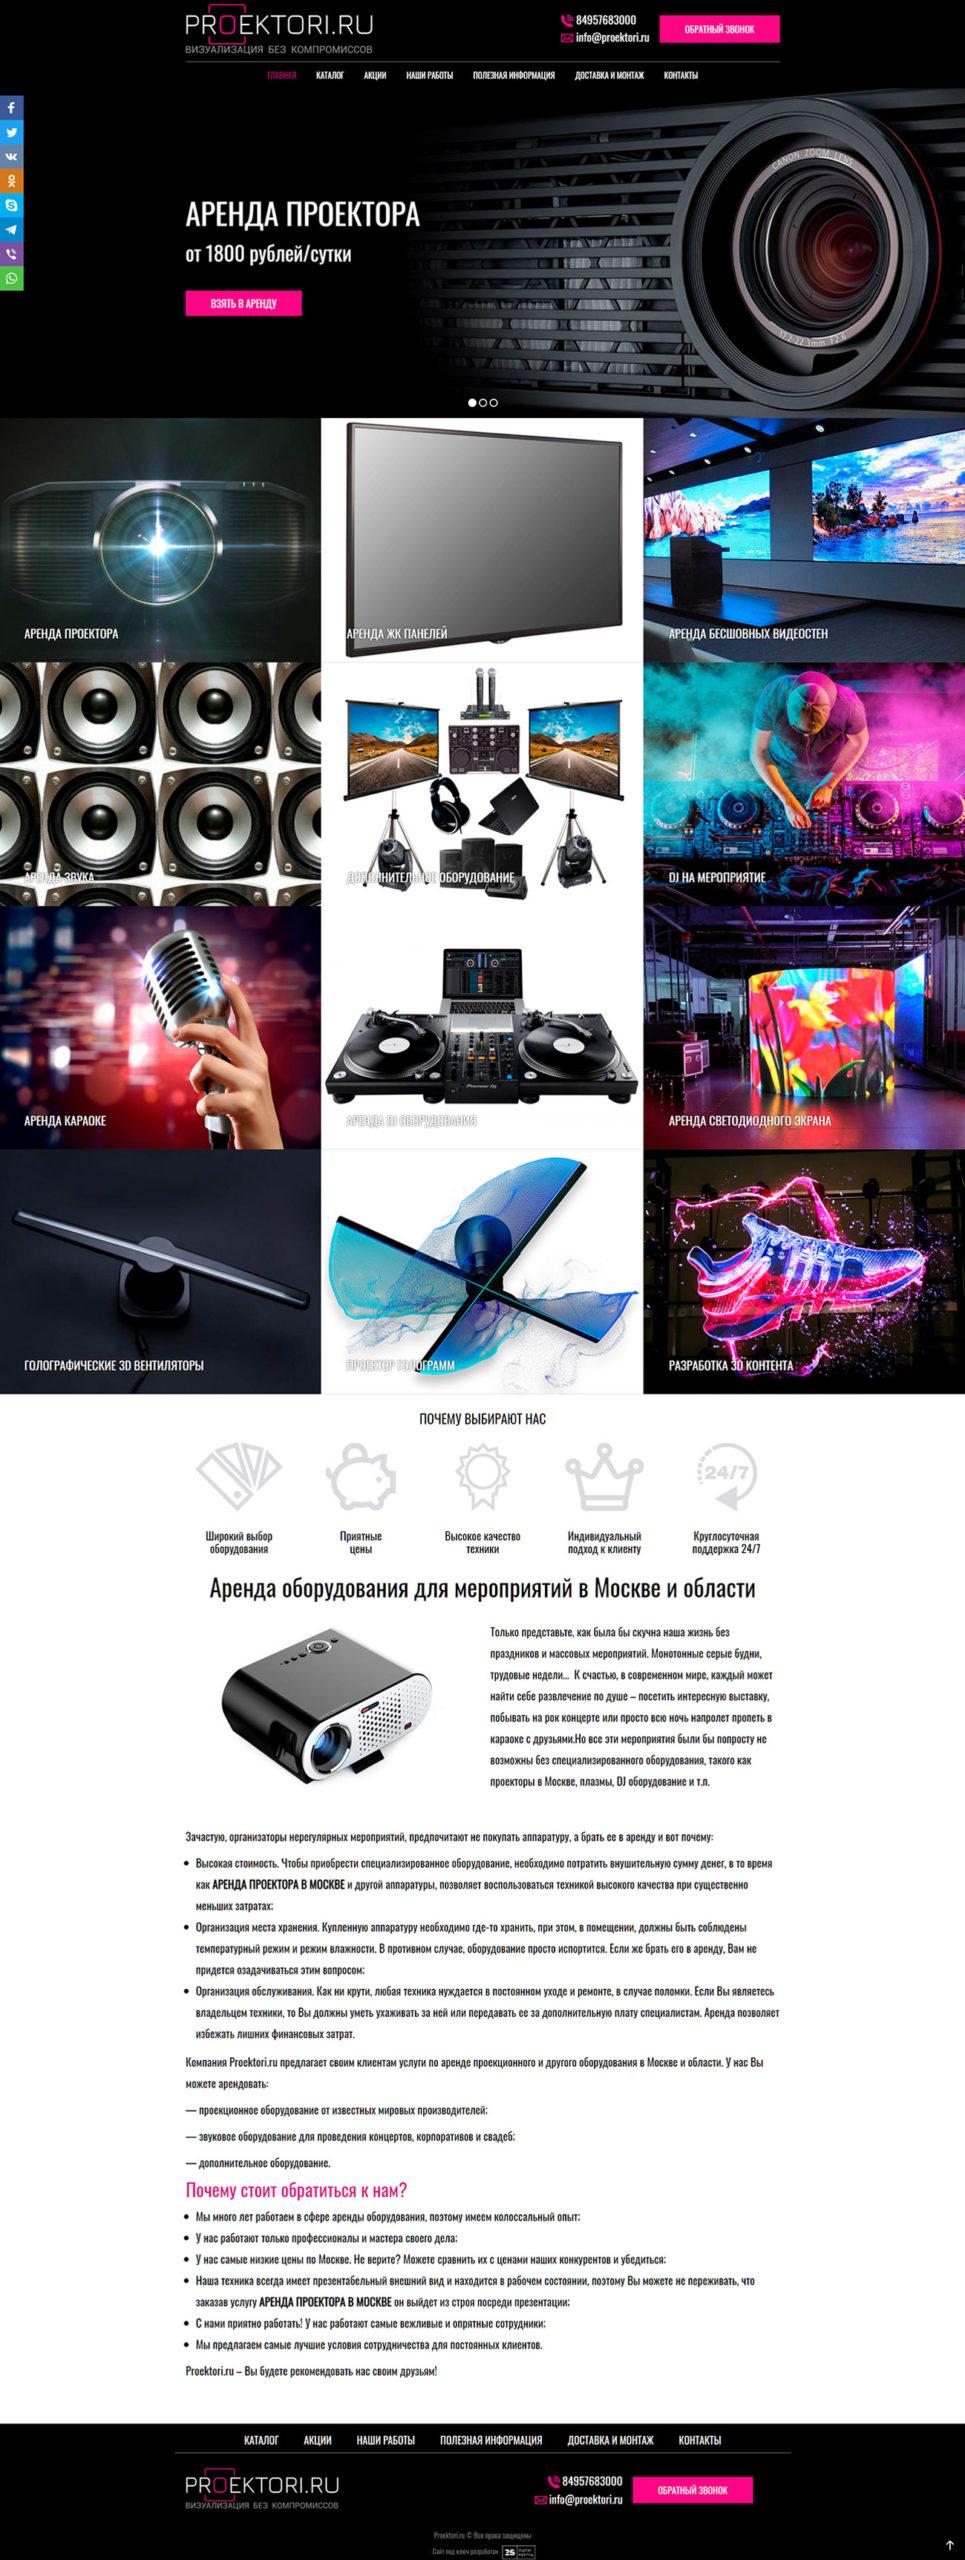 https://28-digital.ru/project/proektori-ru/